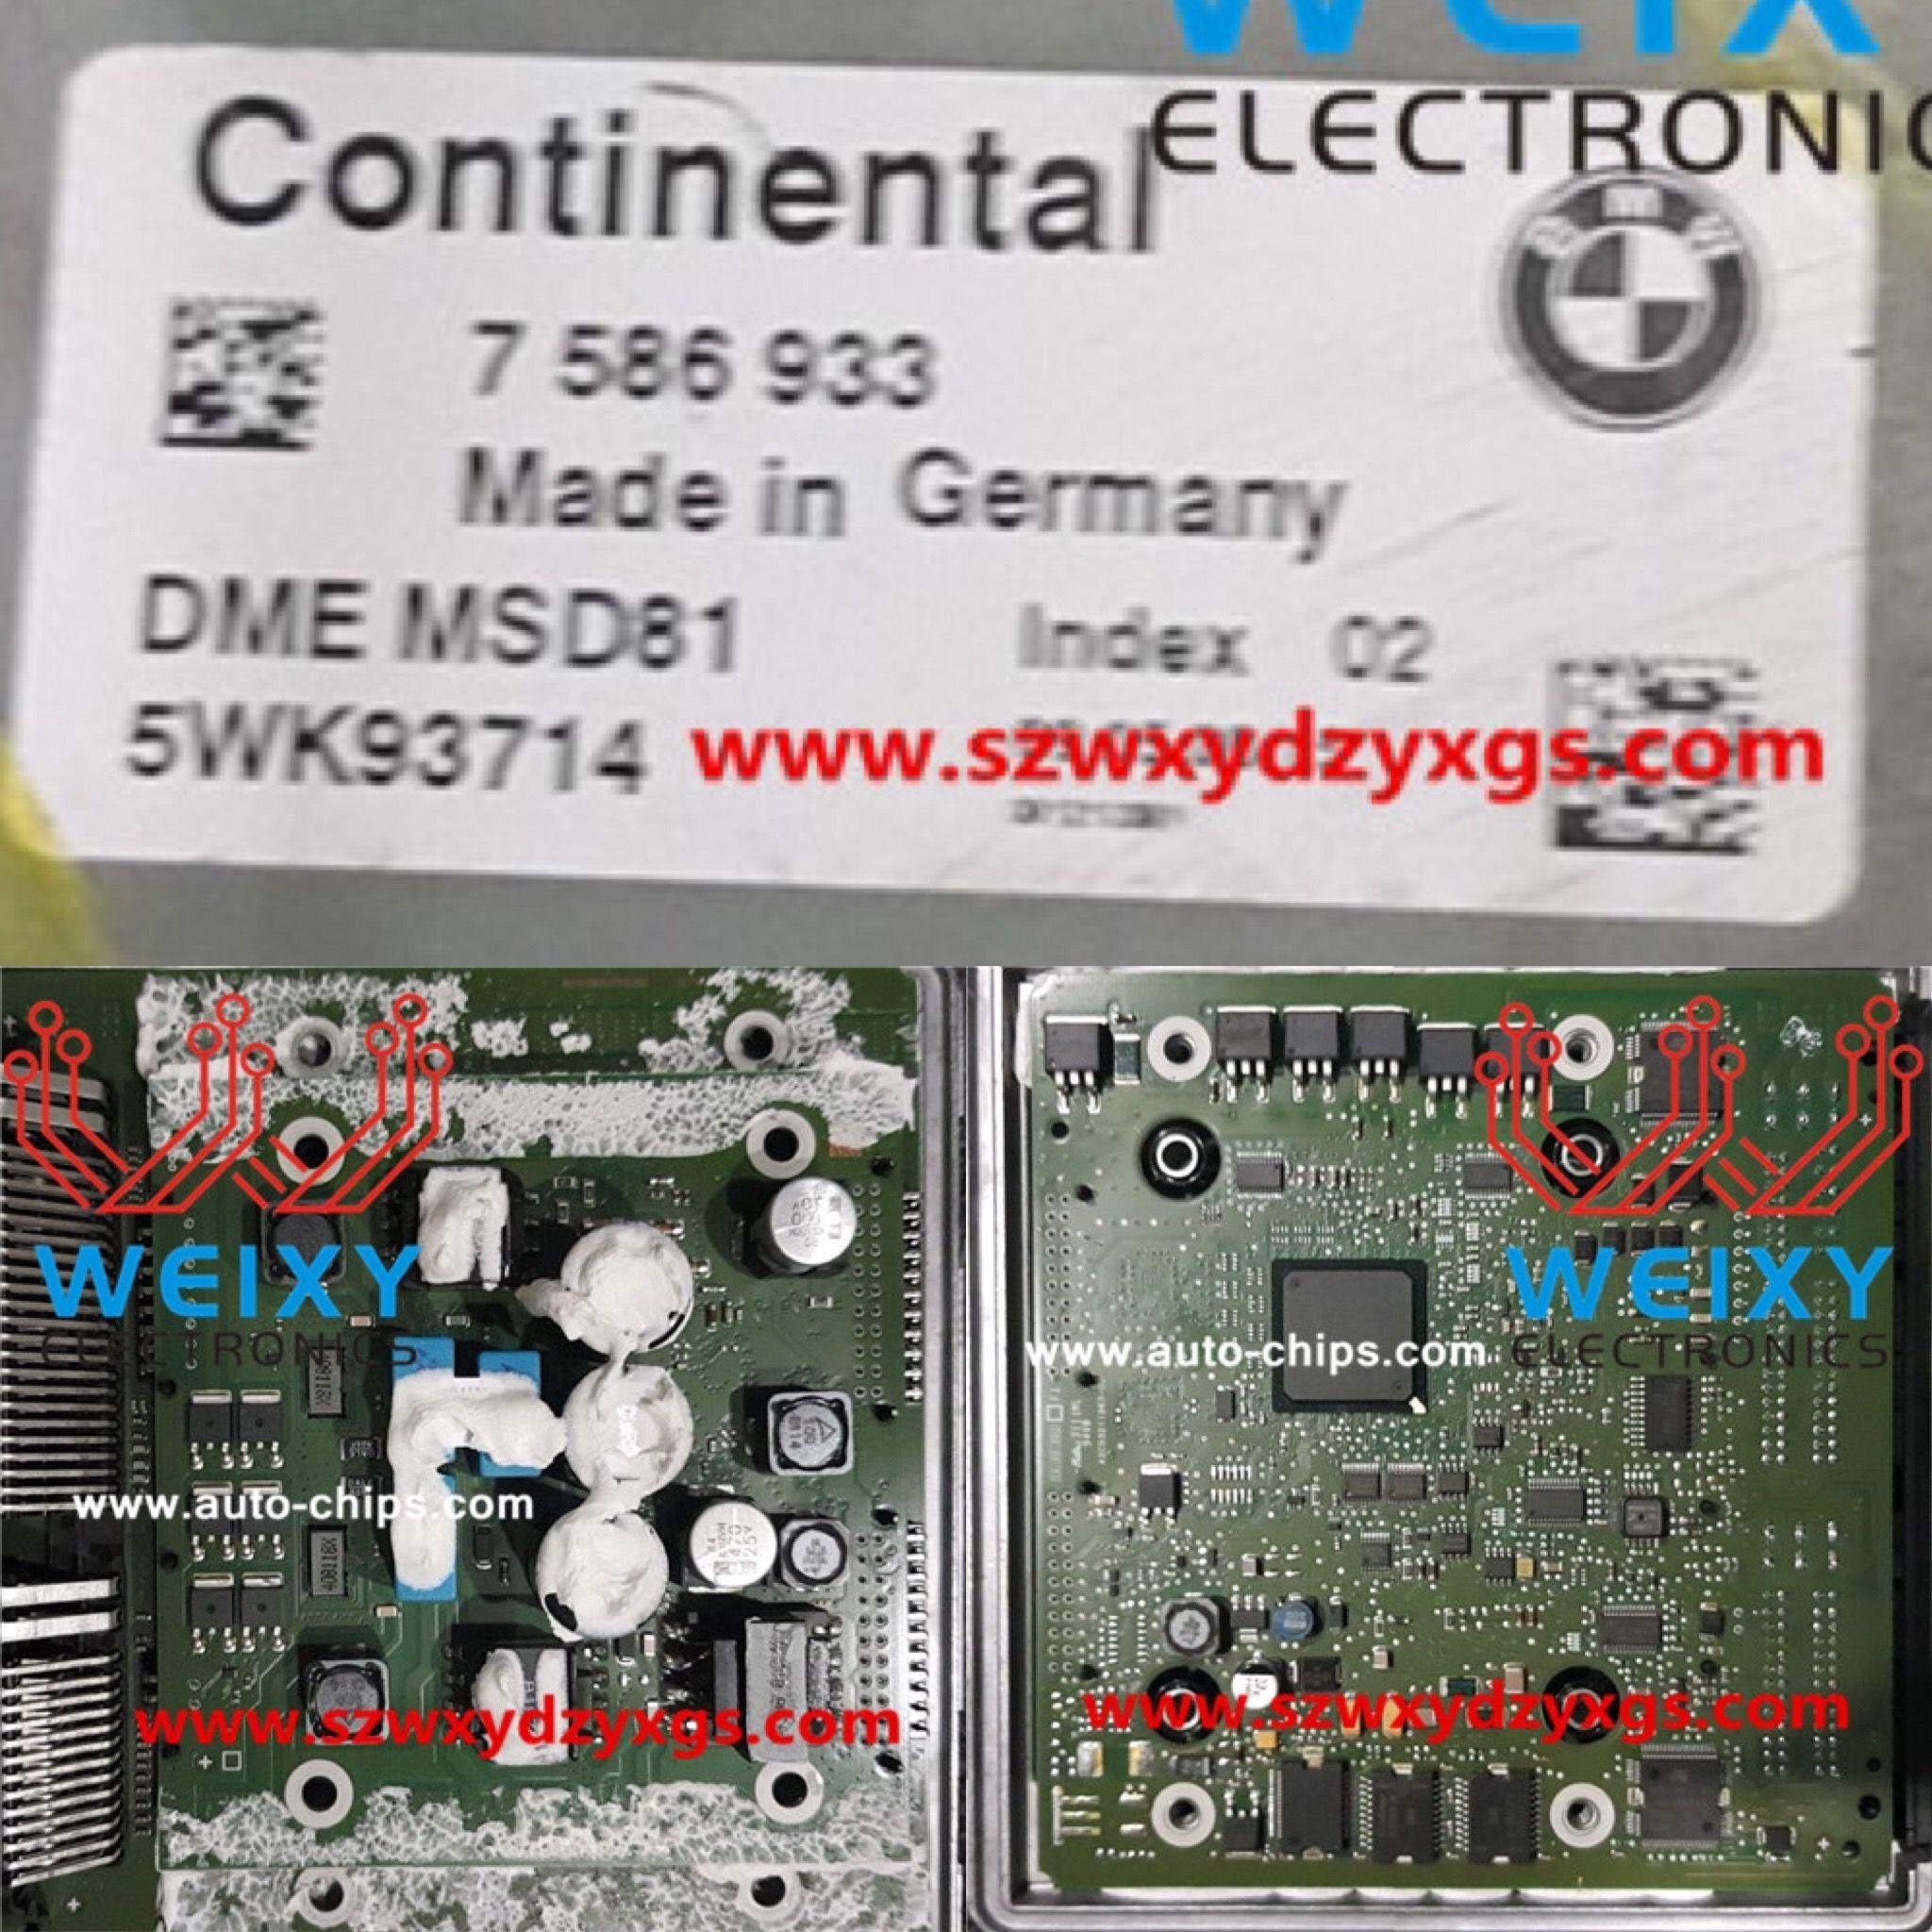 BMW MSD81 DME repair kit. Solve the problems of valvetronic failure, BSD  failure,